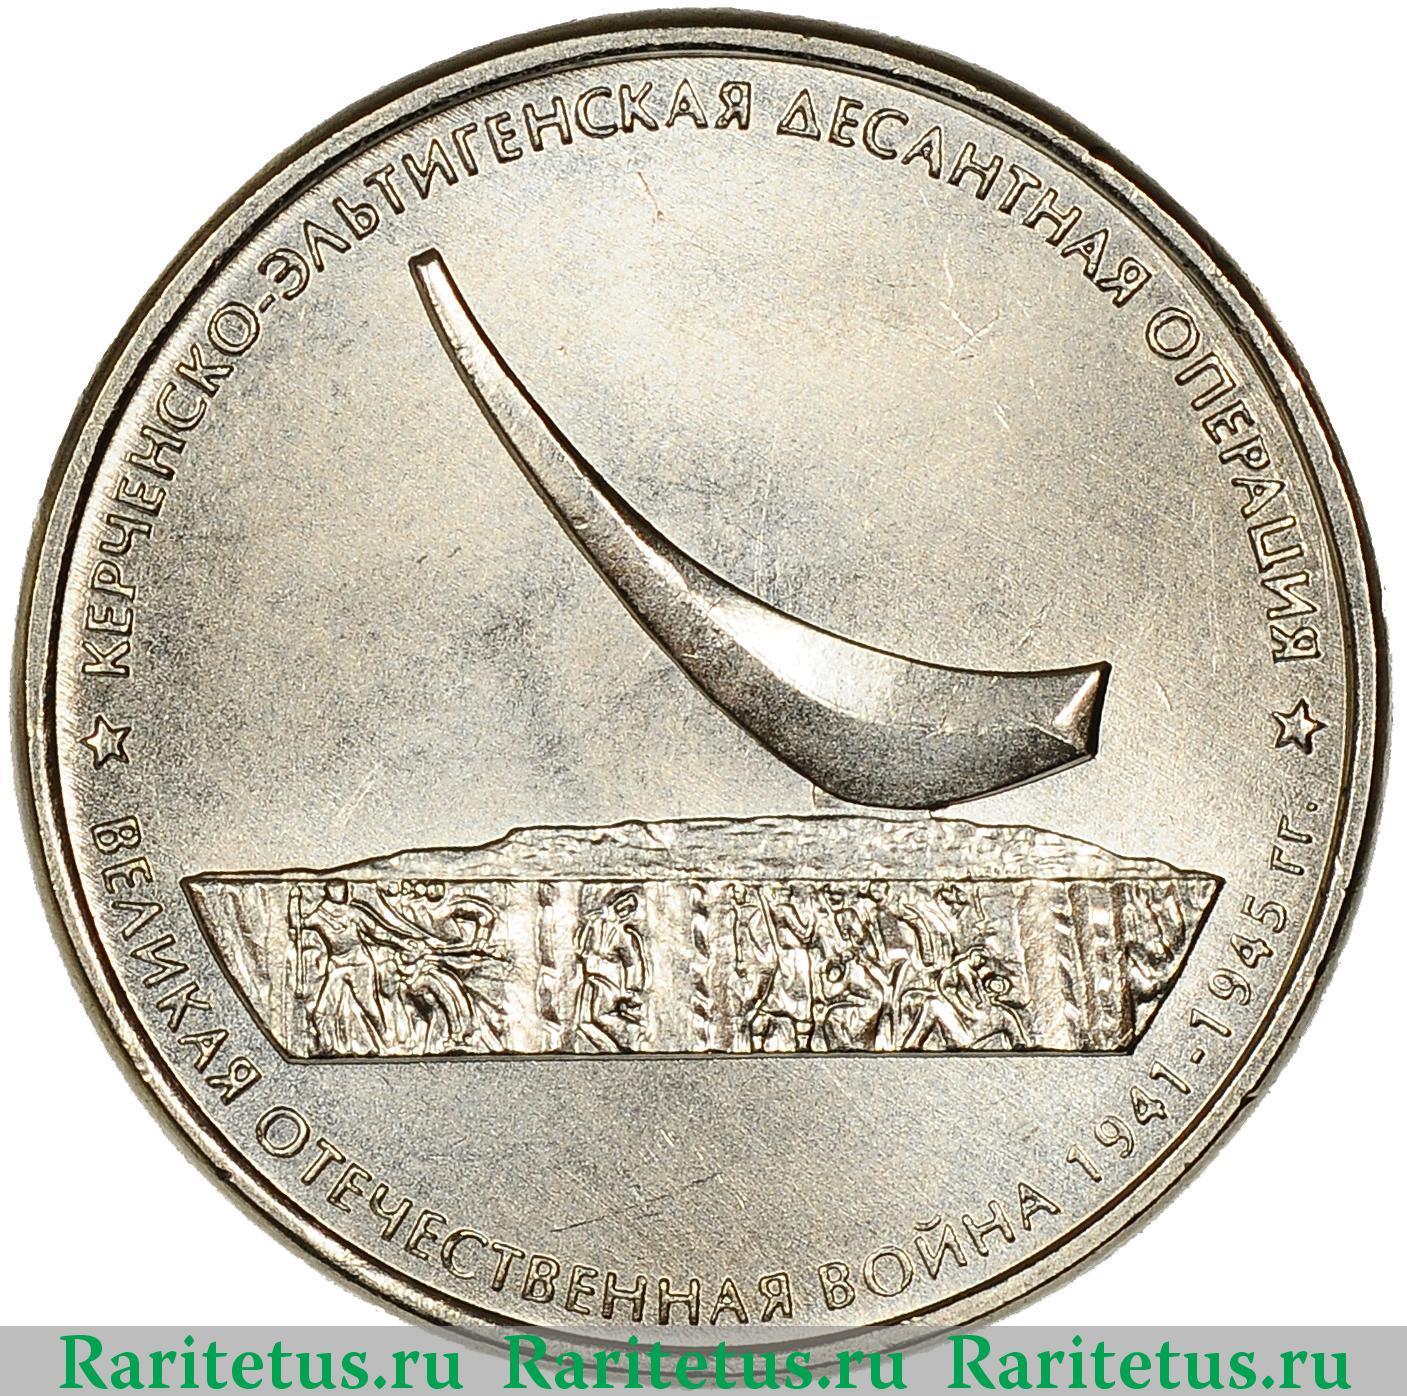 Монета 5 рублей 2015 года монета 50 centu 1925